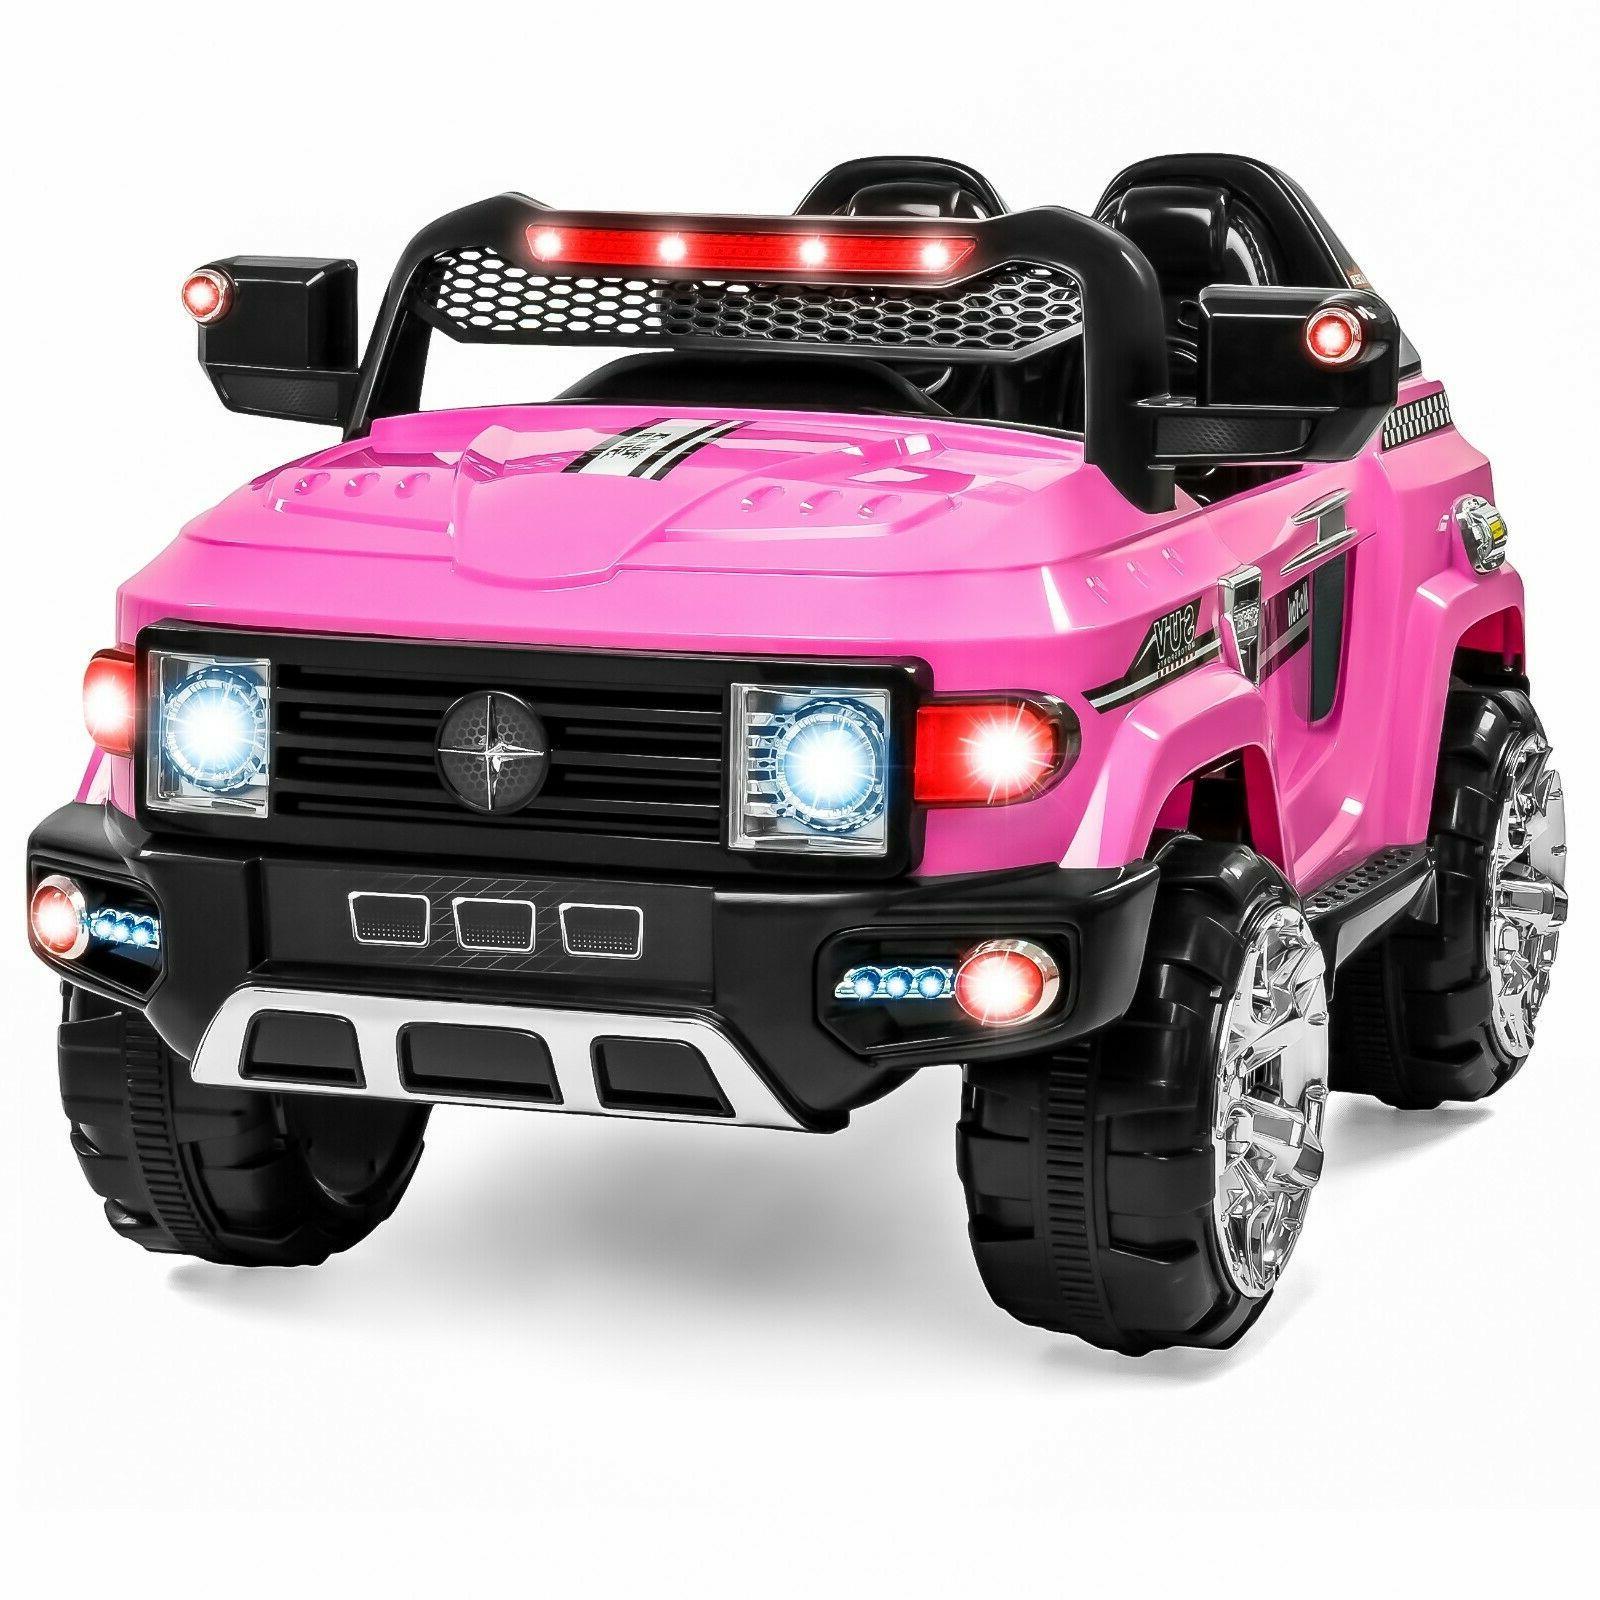 Power Wheels For Girls 12V Ride On Rideable Riding Toddler G